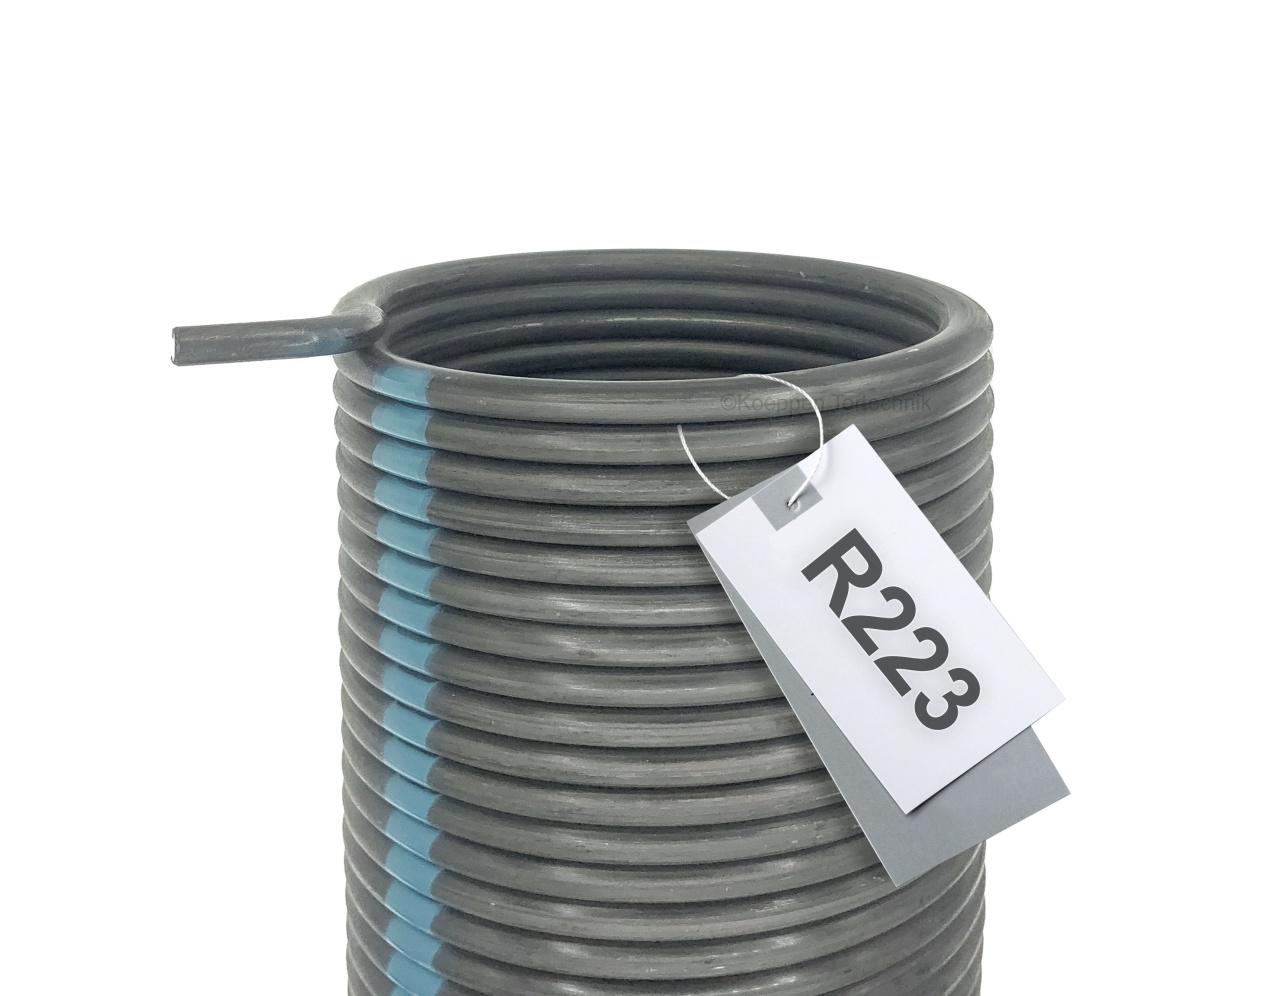 Torsionsfeder R223 passend zu Hörmann Industrie Sectionaltor